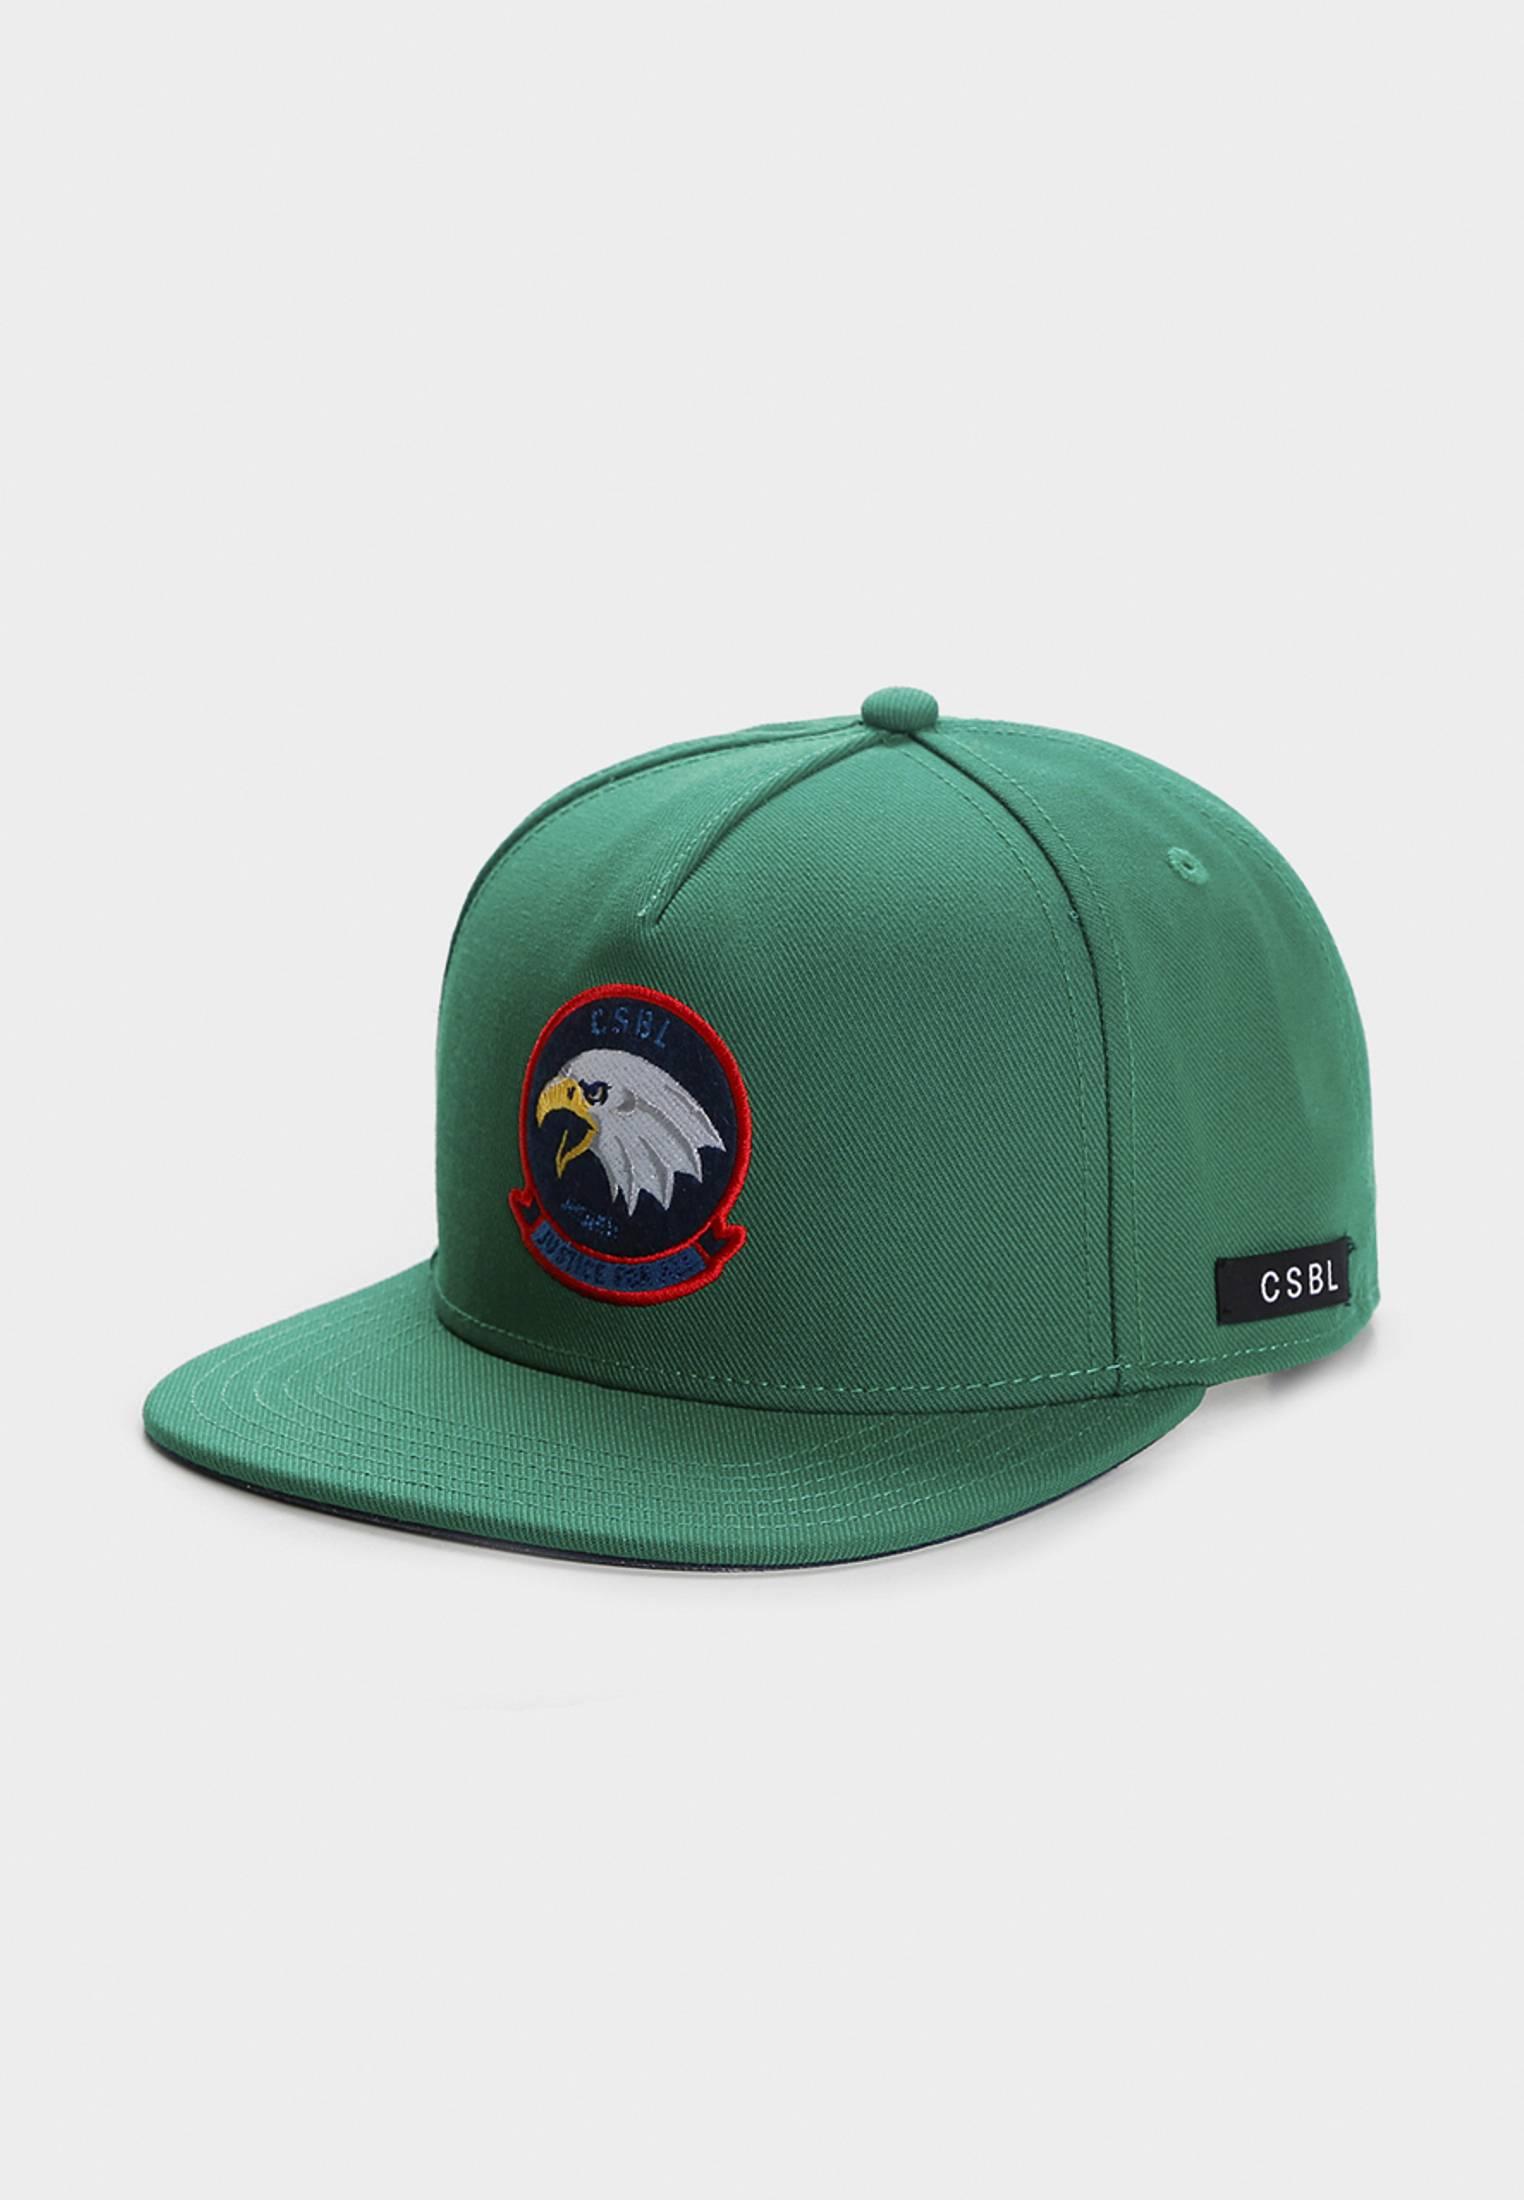 Urban Classics CSBL Freedom Corps Cap green - One Size